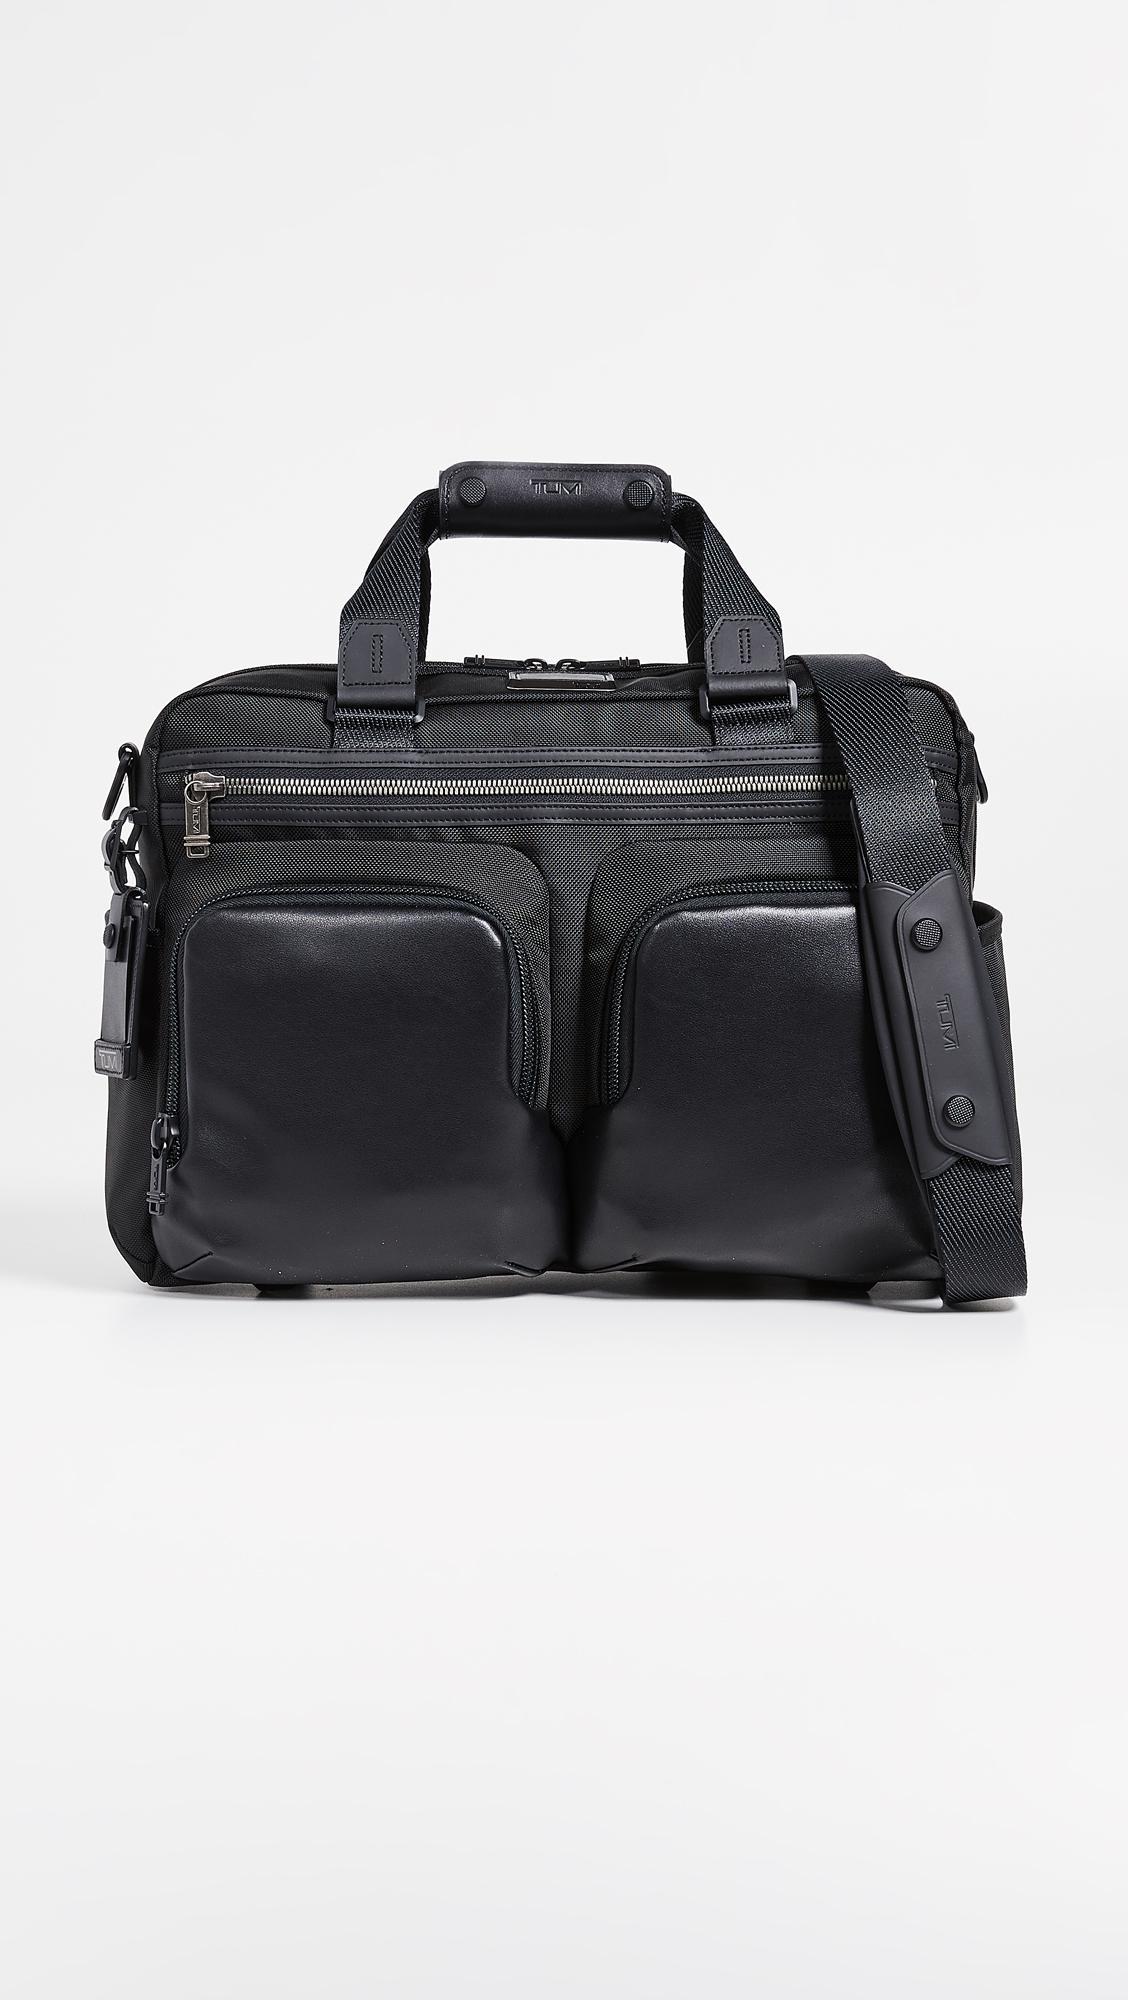 c49994757f31 Lyst - Tumi Alpha Bravo Hunter Messenger Bag in Black for Men